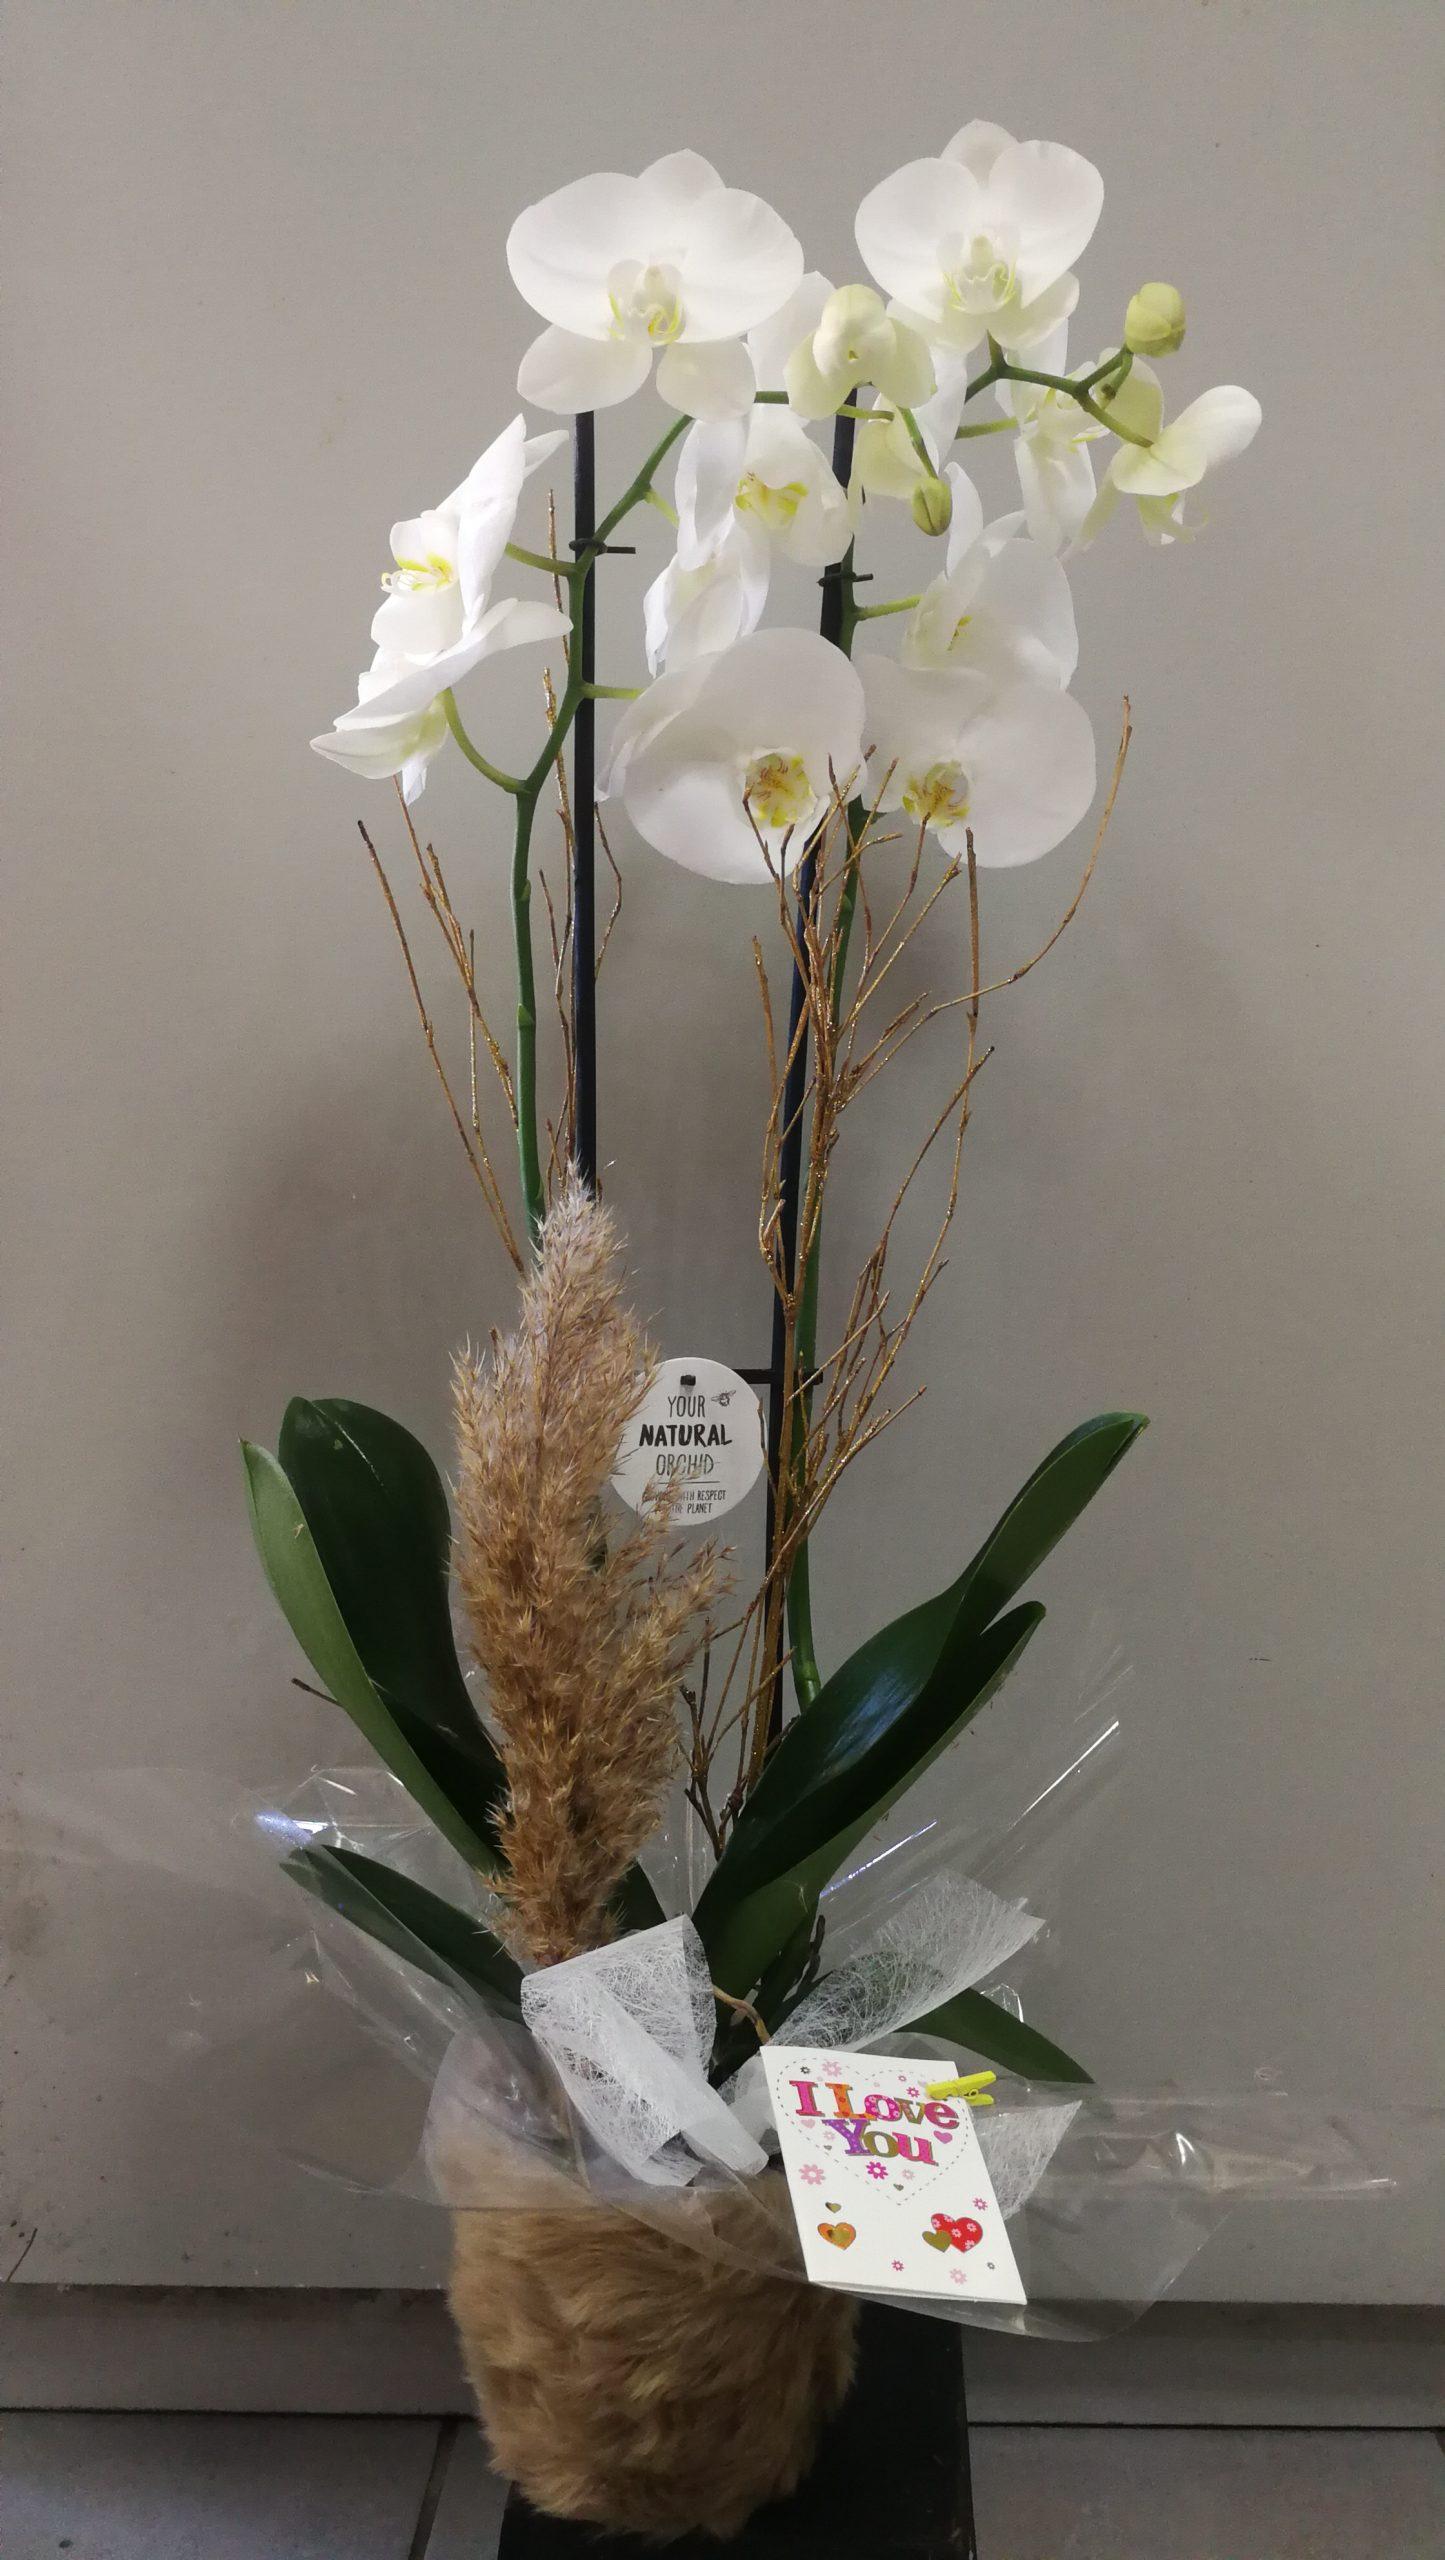 Orquídea con base 48€